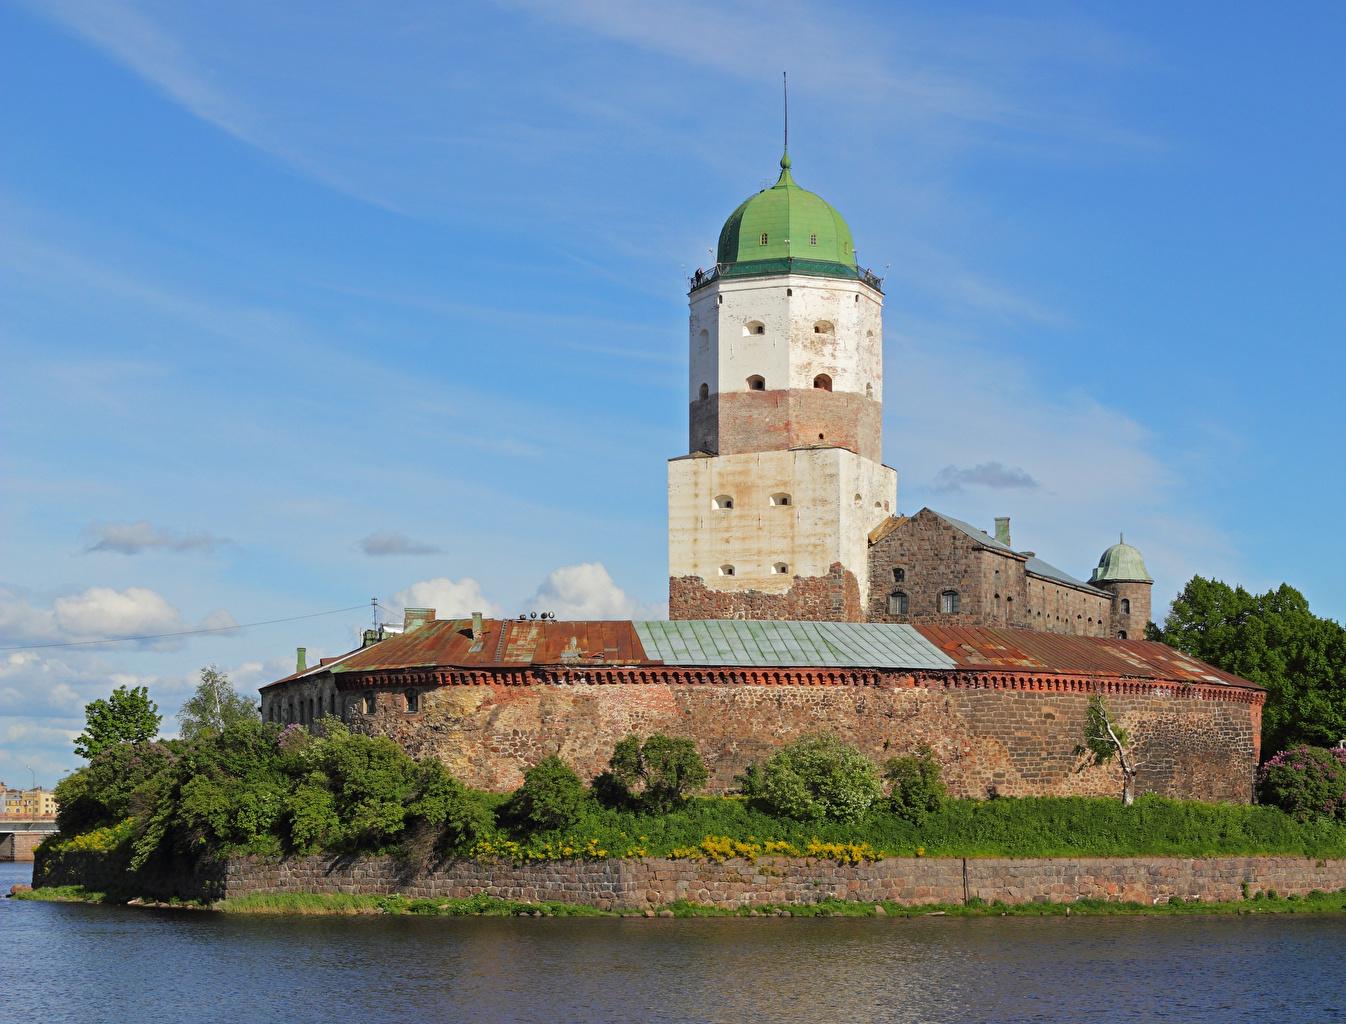 Фото Россия Vyborg castle, Vyborg, Leningrad region Купол Замки Города